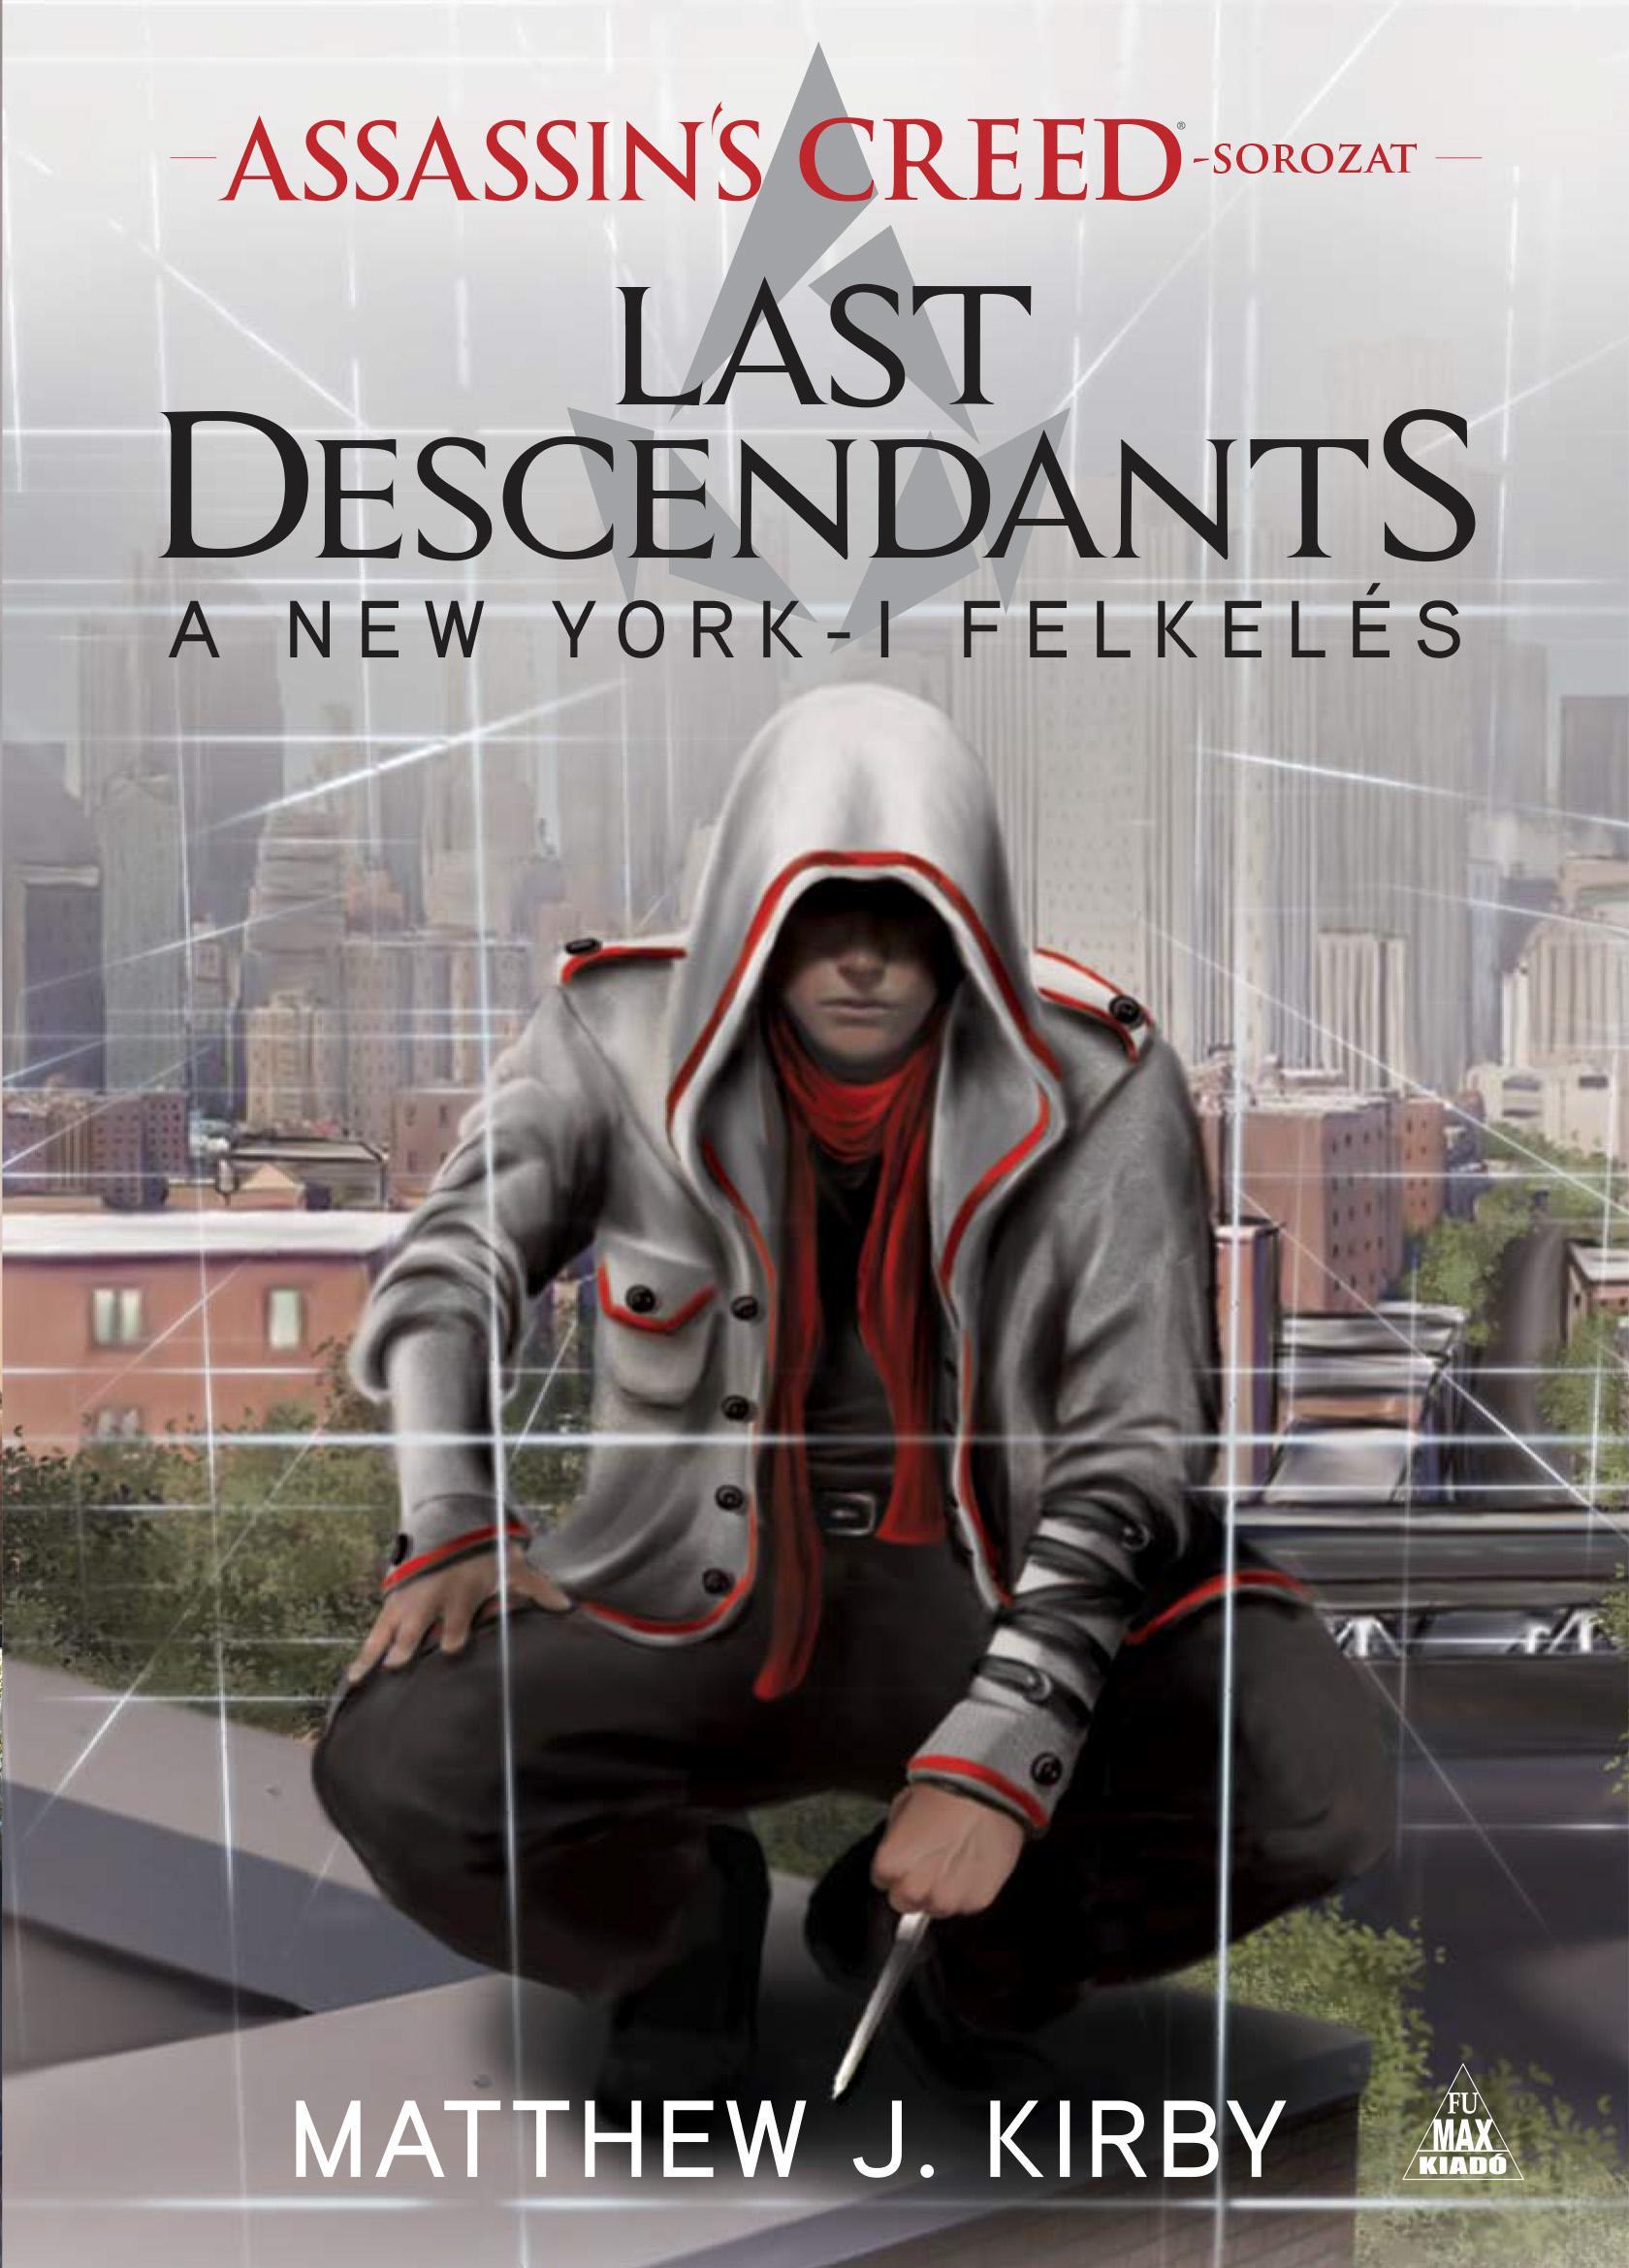 KIRBY, MATTHEW J. - ASSASSIN'S CREED - LAST DESCENDANTS - A NEW YORK-I FELKELÉS